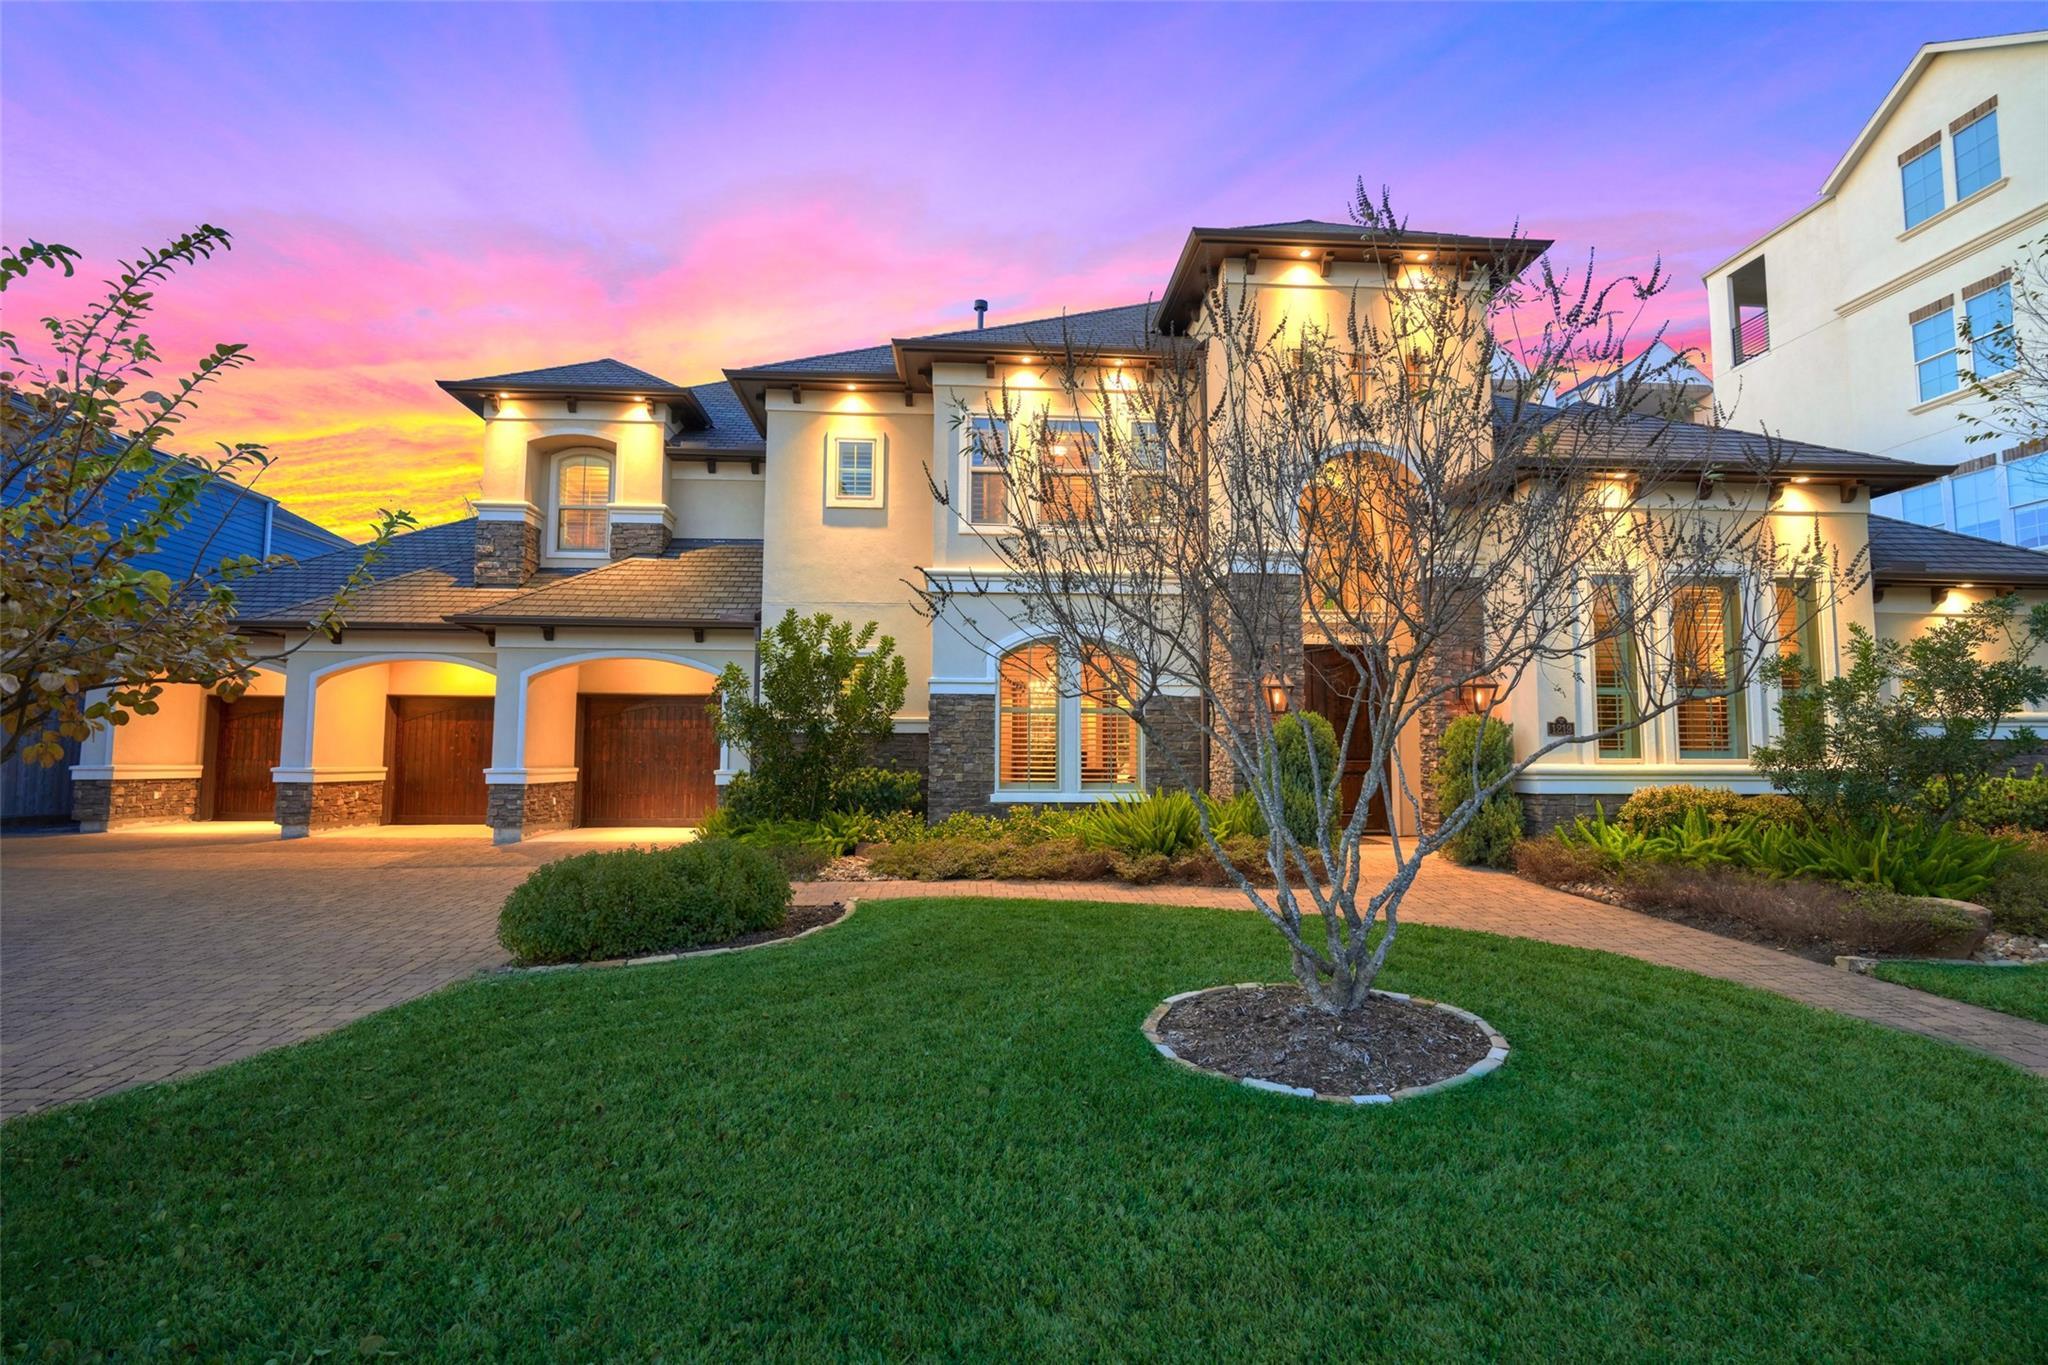 1219 W 23rd Street Property Photo - Houston, TX real estate listing